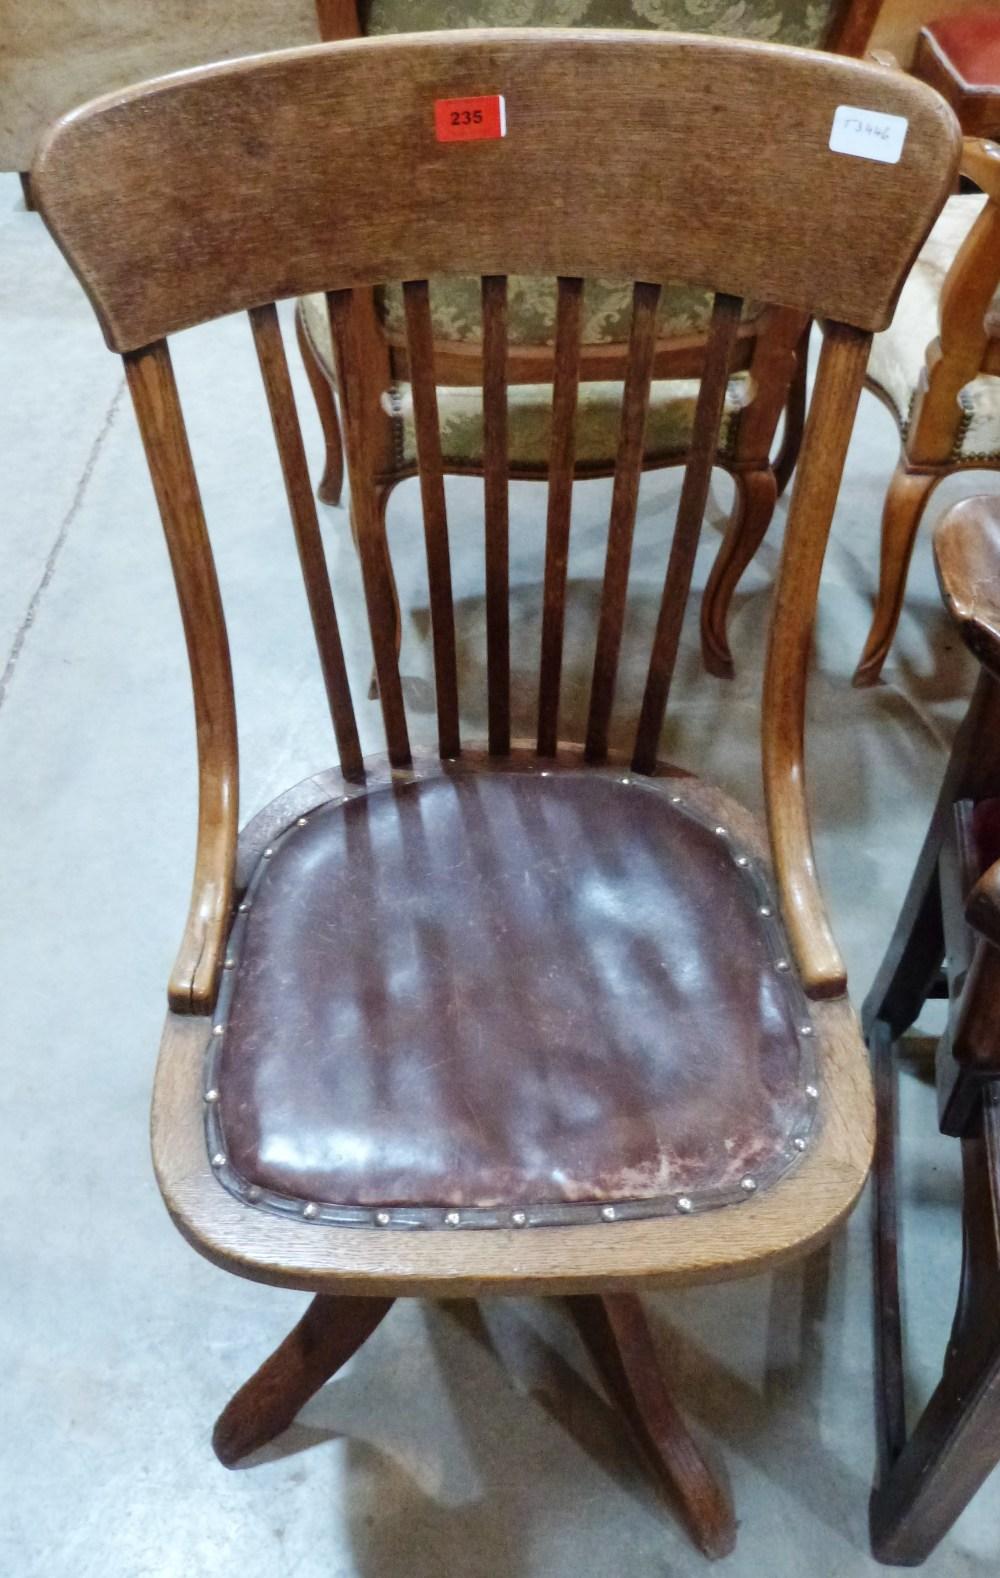 Lot 235 - A 1920s oak revolving office chair